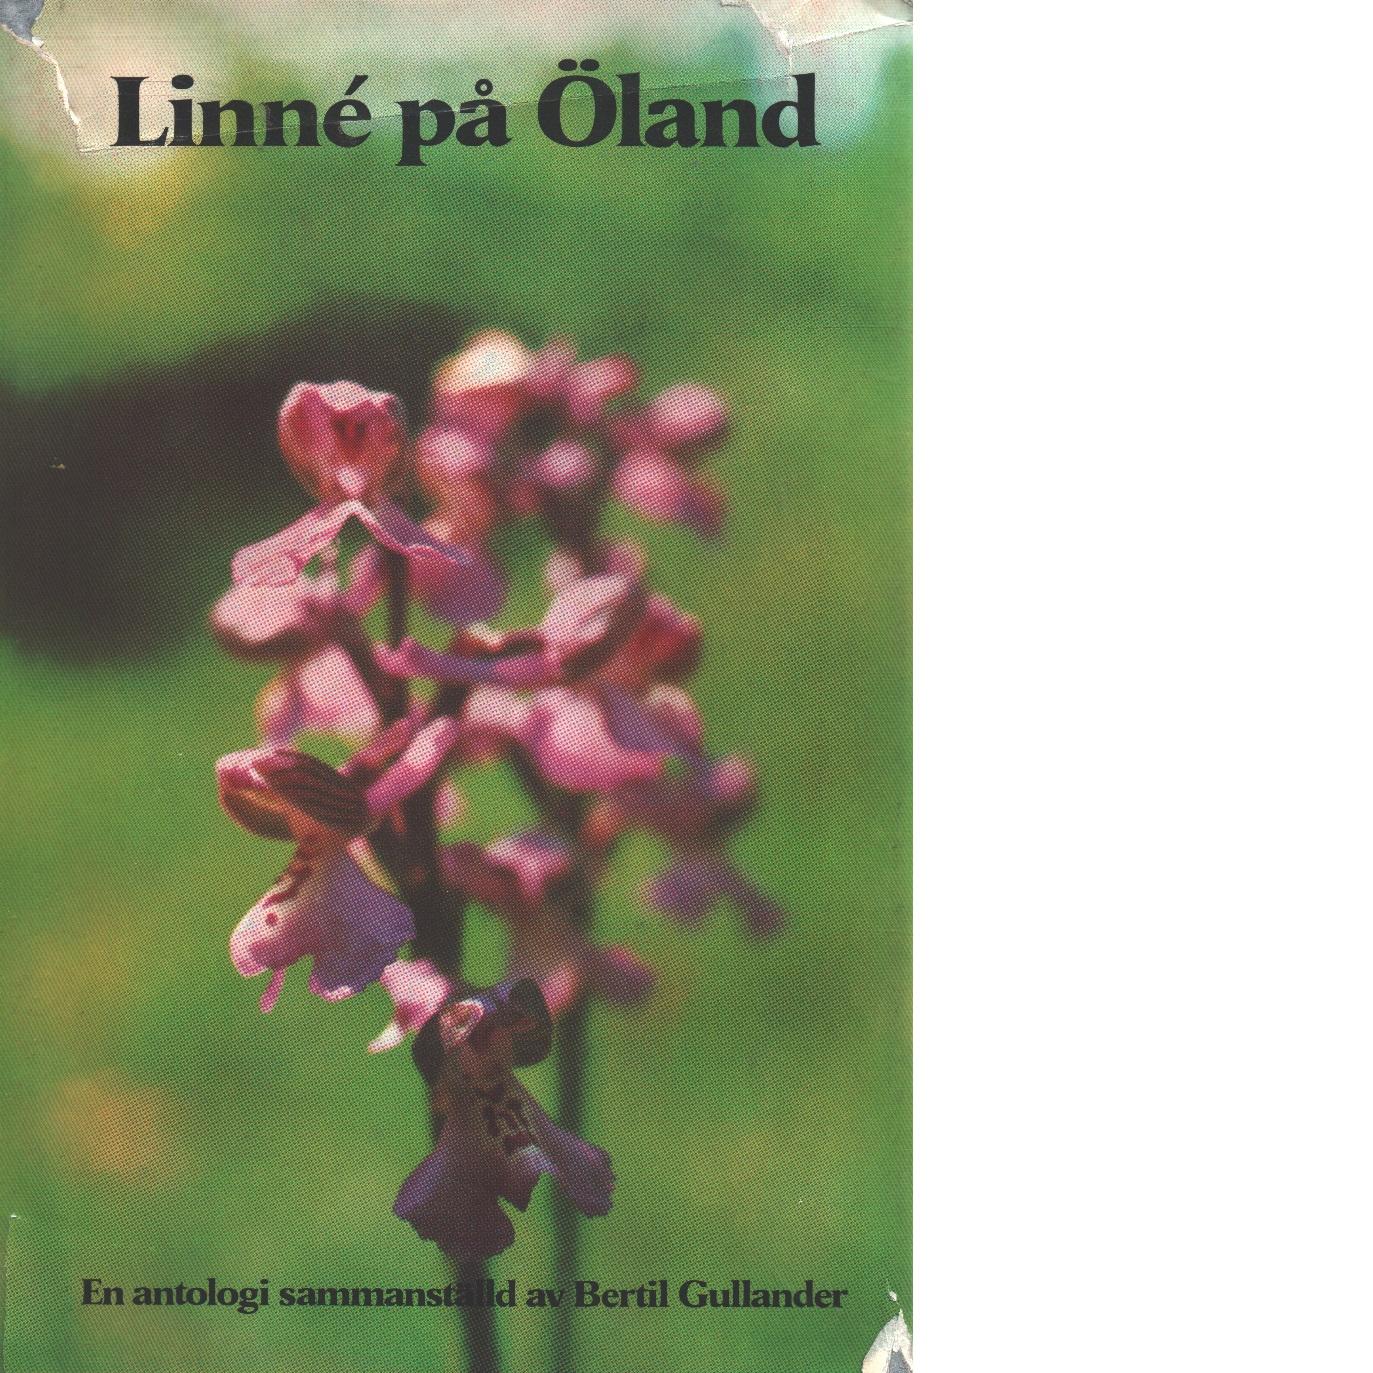 Linné på Öland - Linné, Carl Von